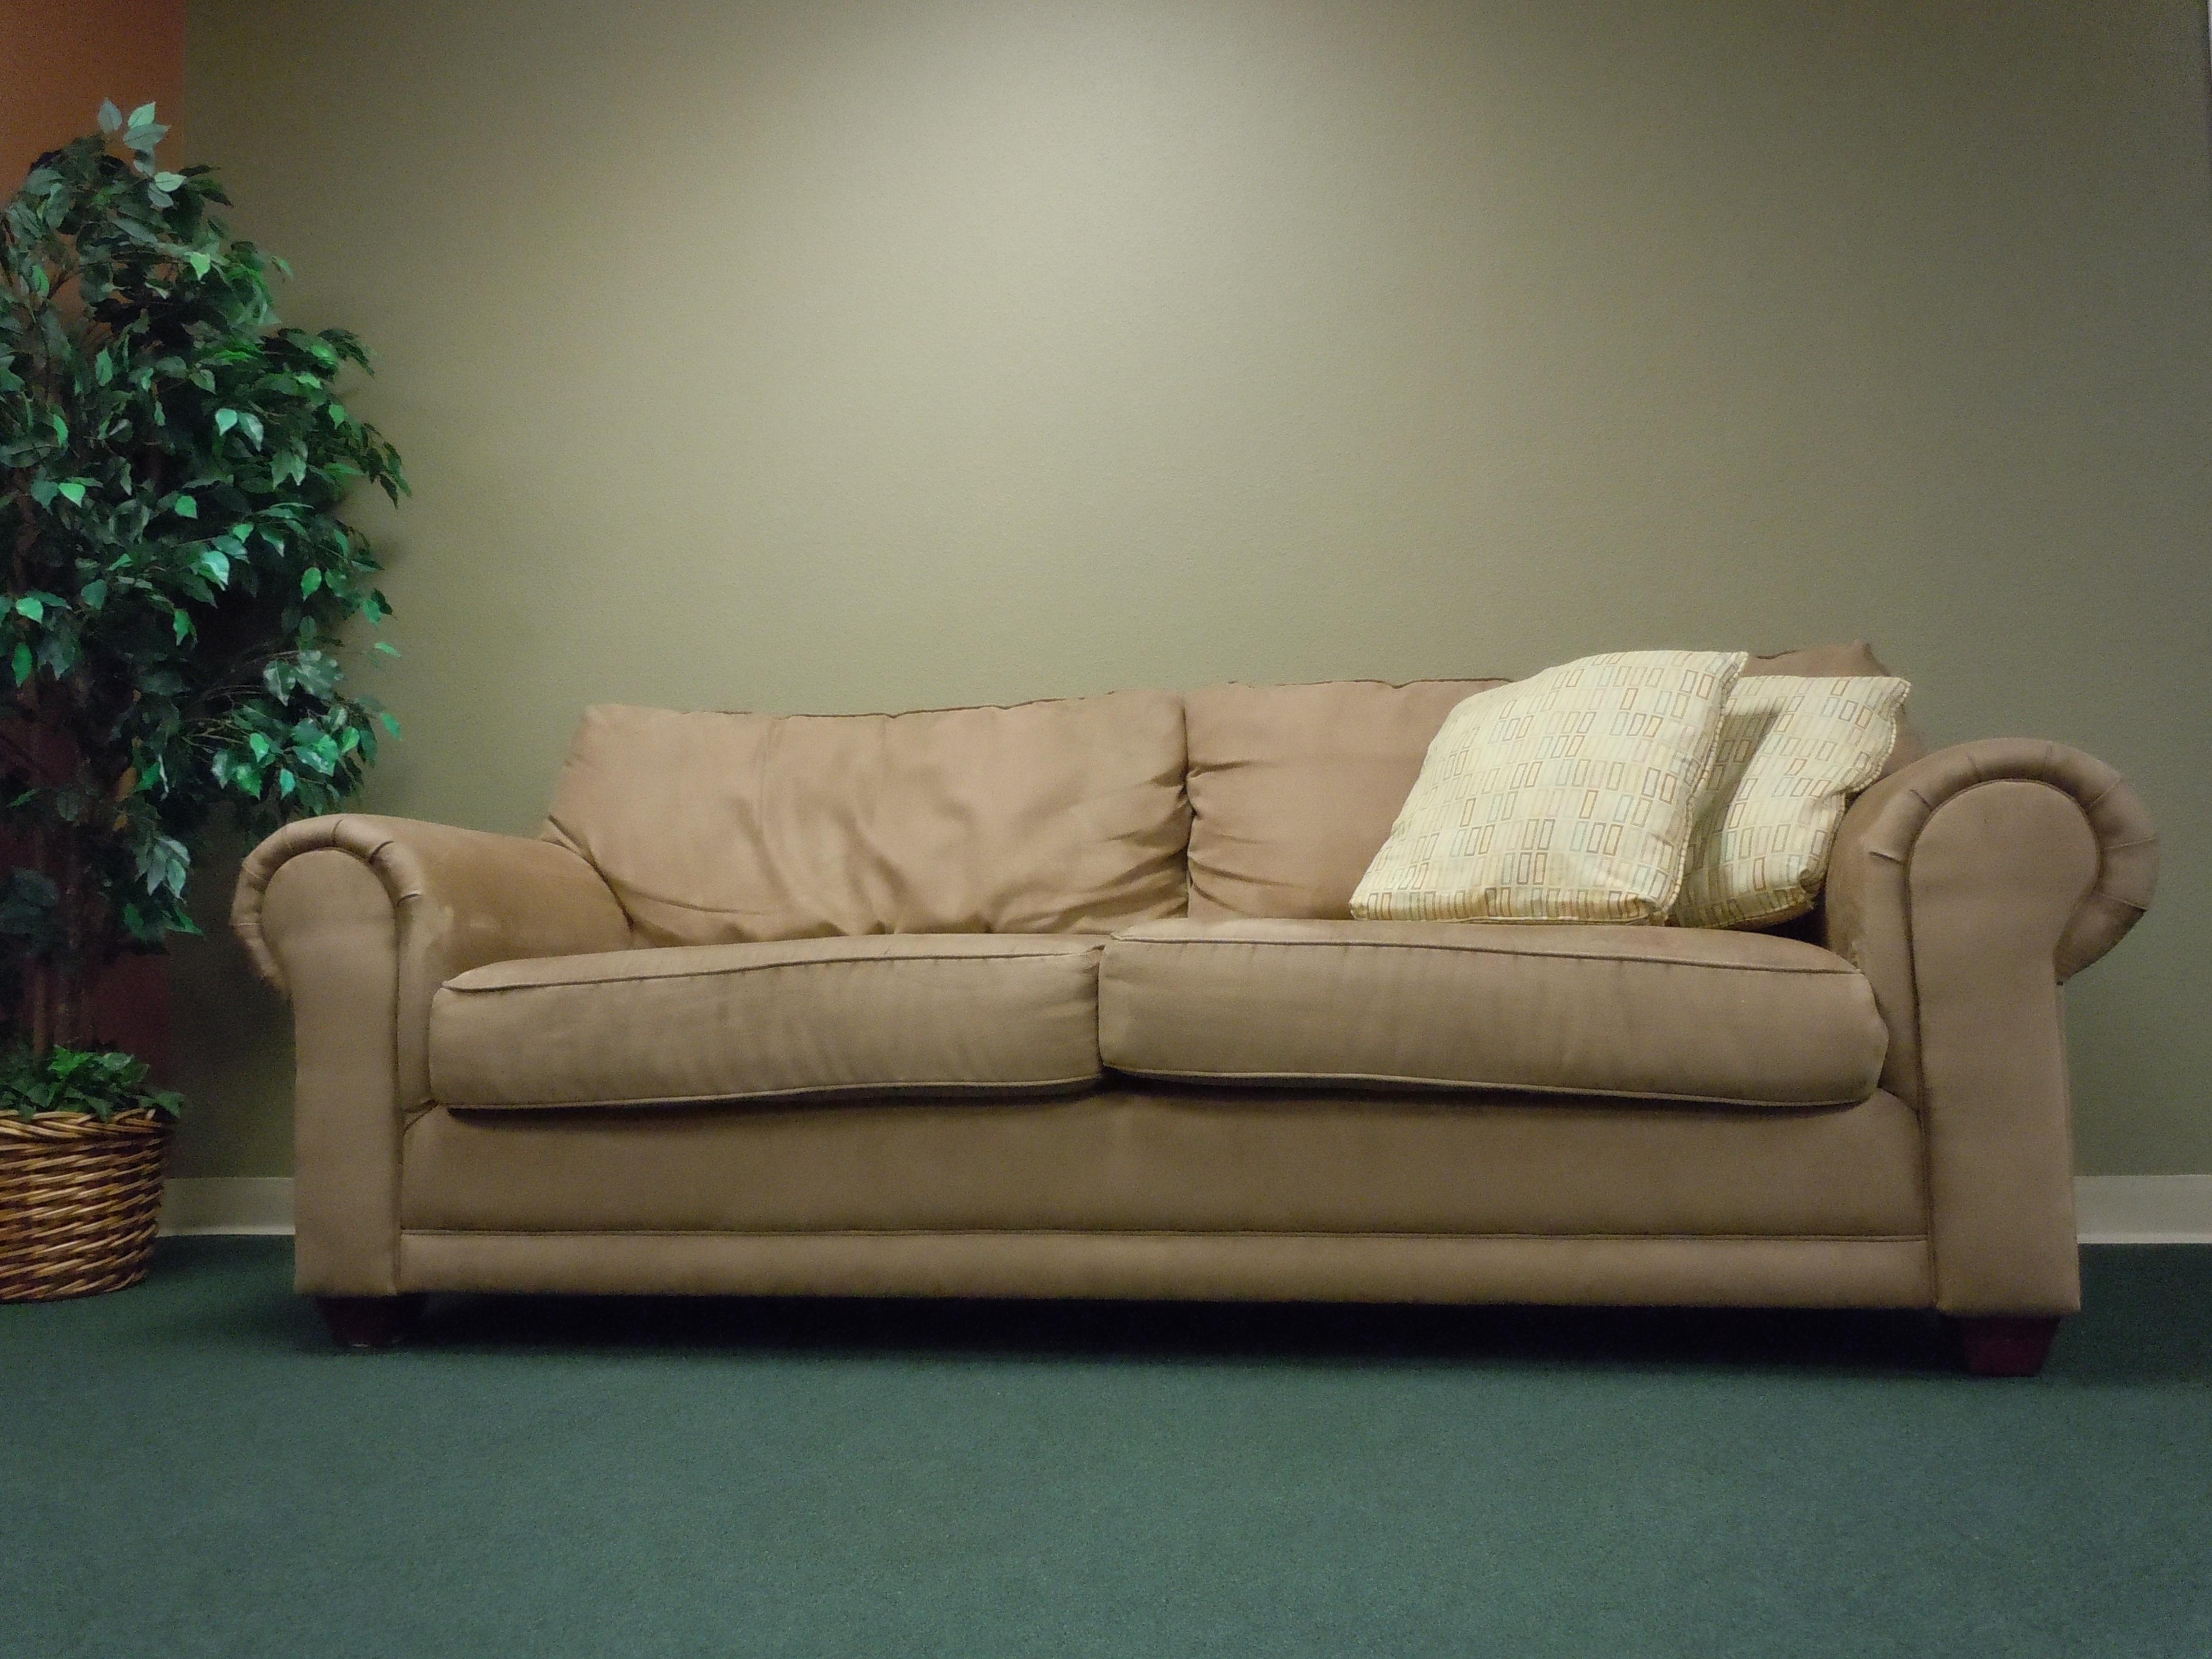 Gambar Lantai Kursi Bersantai Ruang Keluarga Mebel Kamar